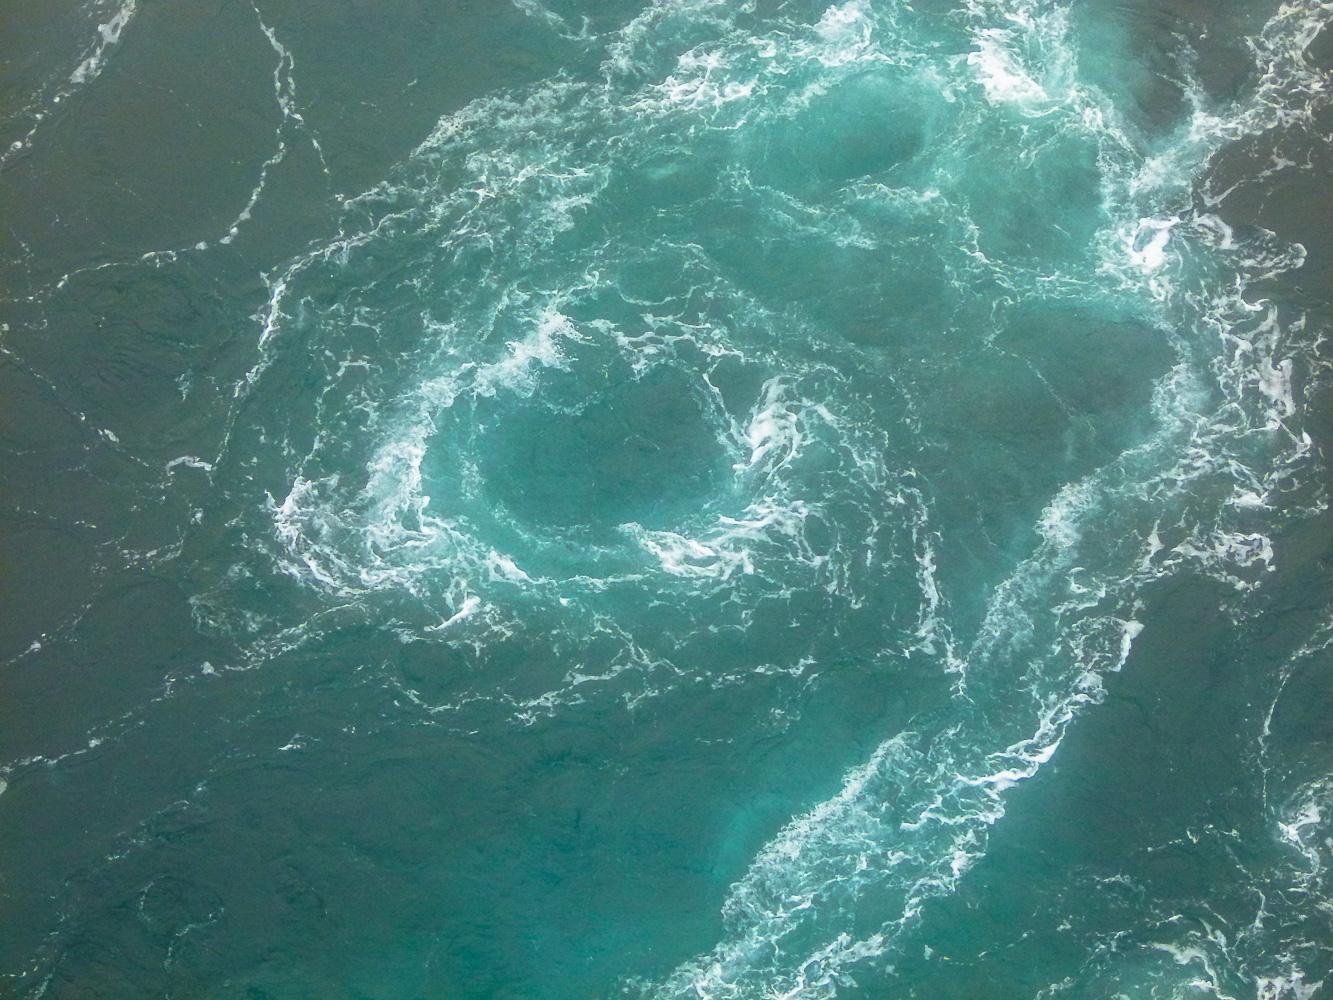 saltstraumen tidal current bodø